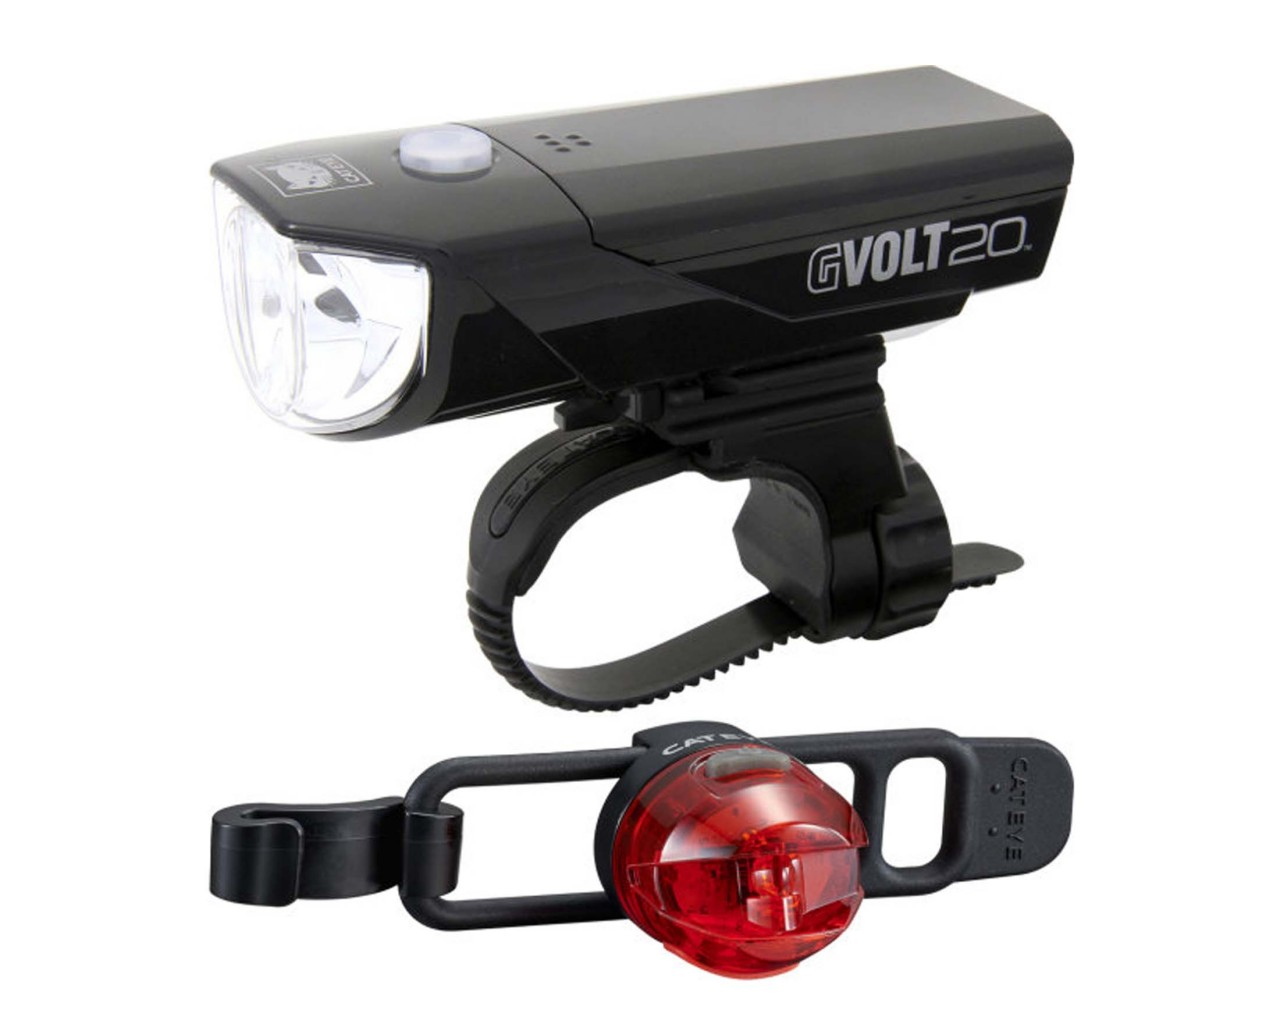 Cateye Rechargeable Headlight GVolt 20RC + Loop 2G